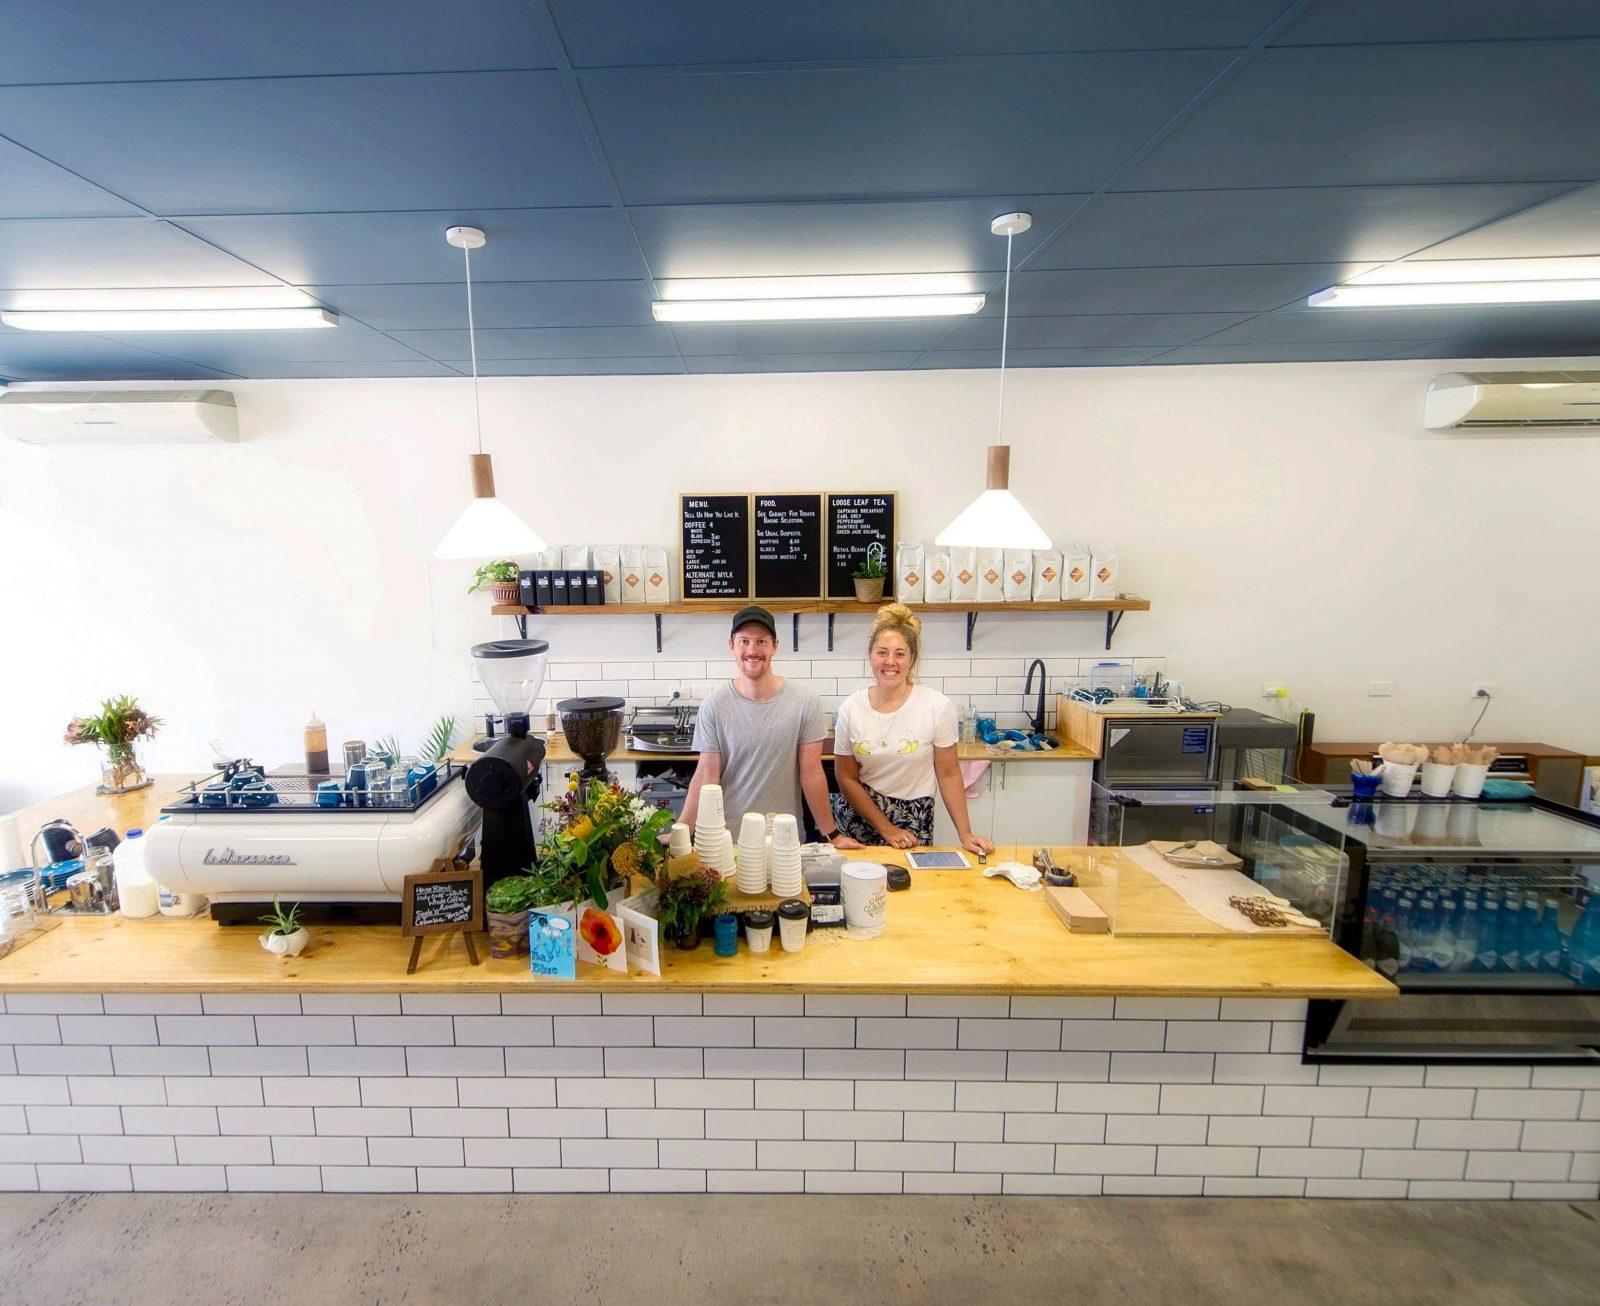 Espresso bar, laMarzocco, white whale coffee roasters, mount gambier cafe, coffee, limestone coast